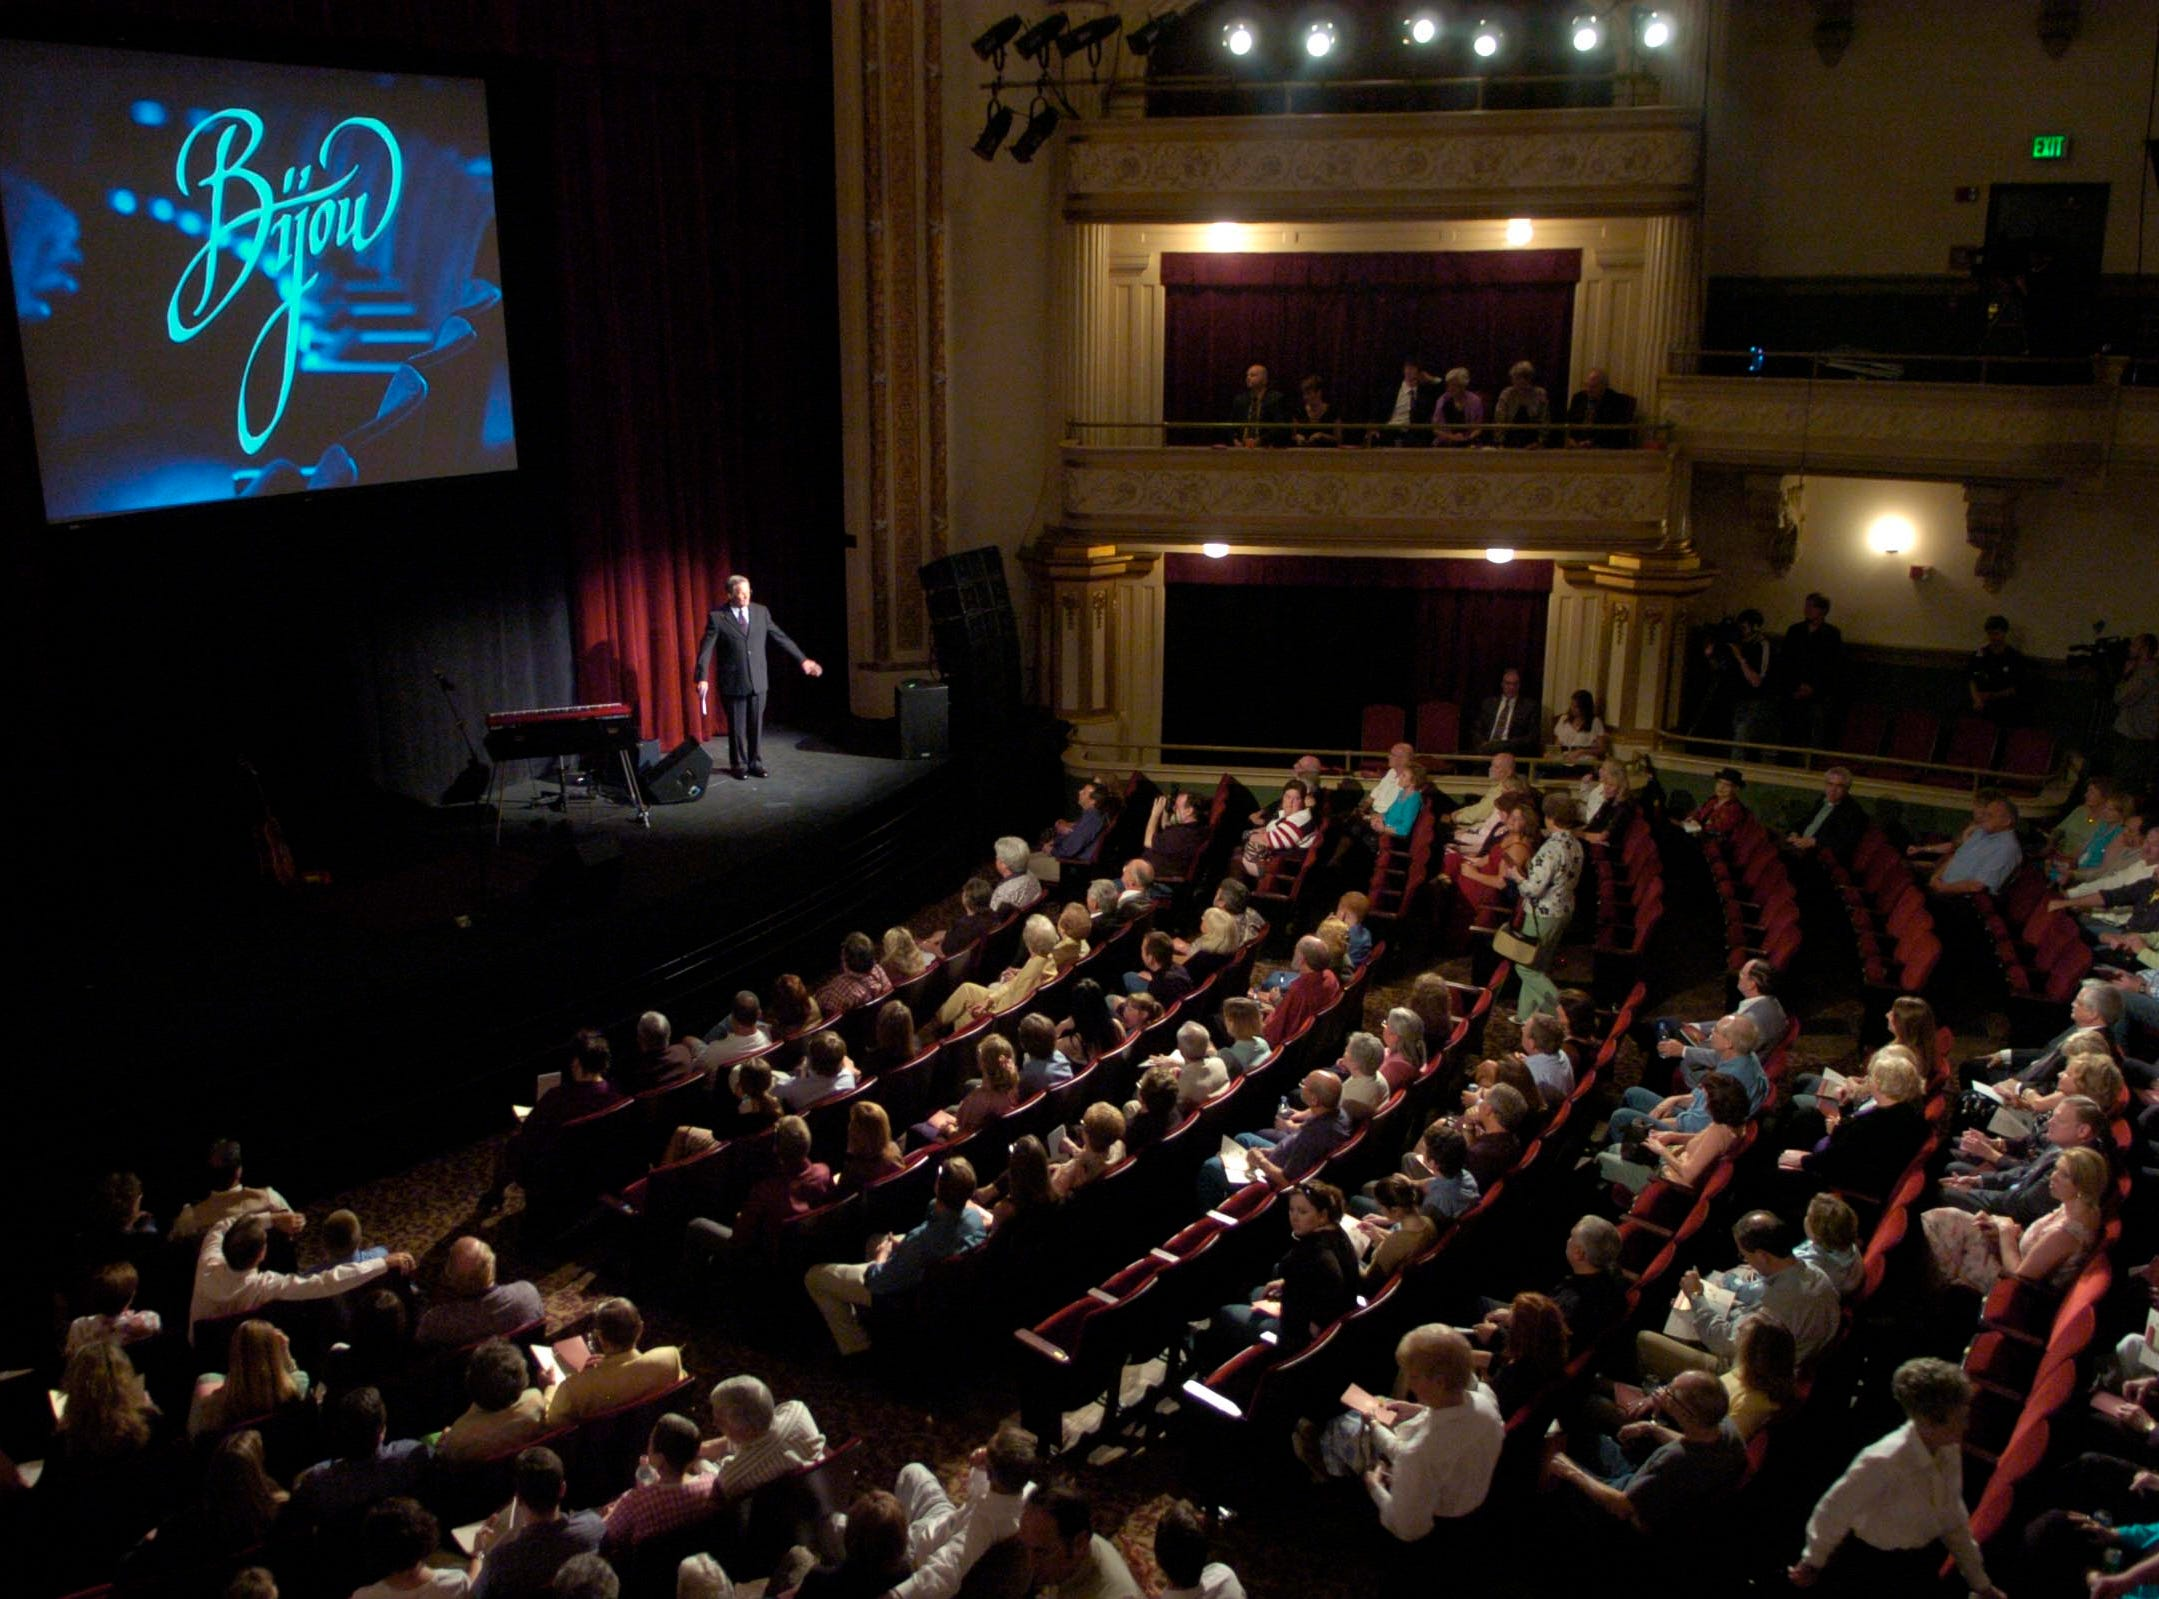 Bijou Theatre Opening Night Celebration. 2006